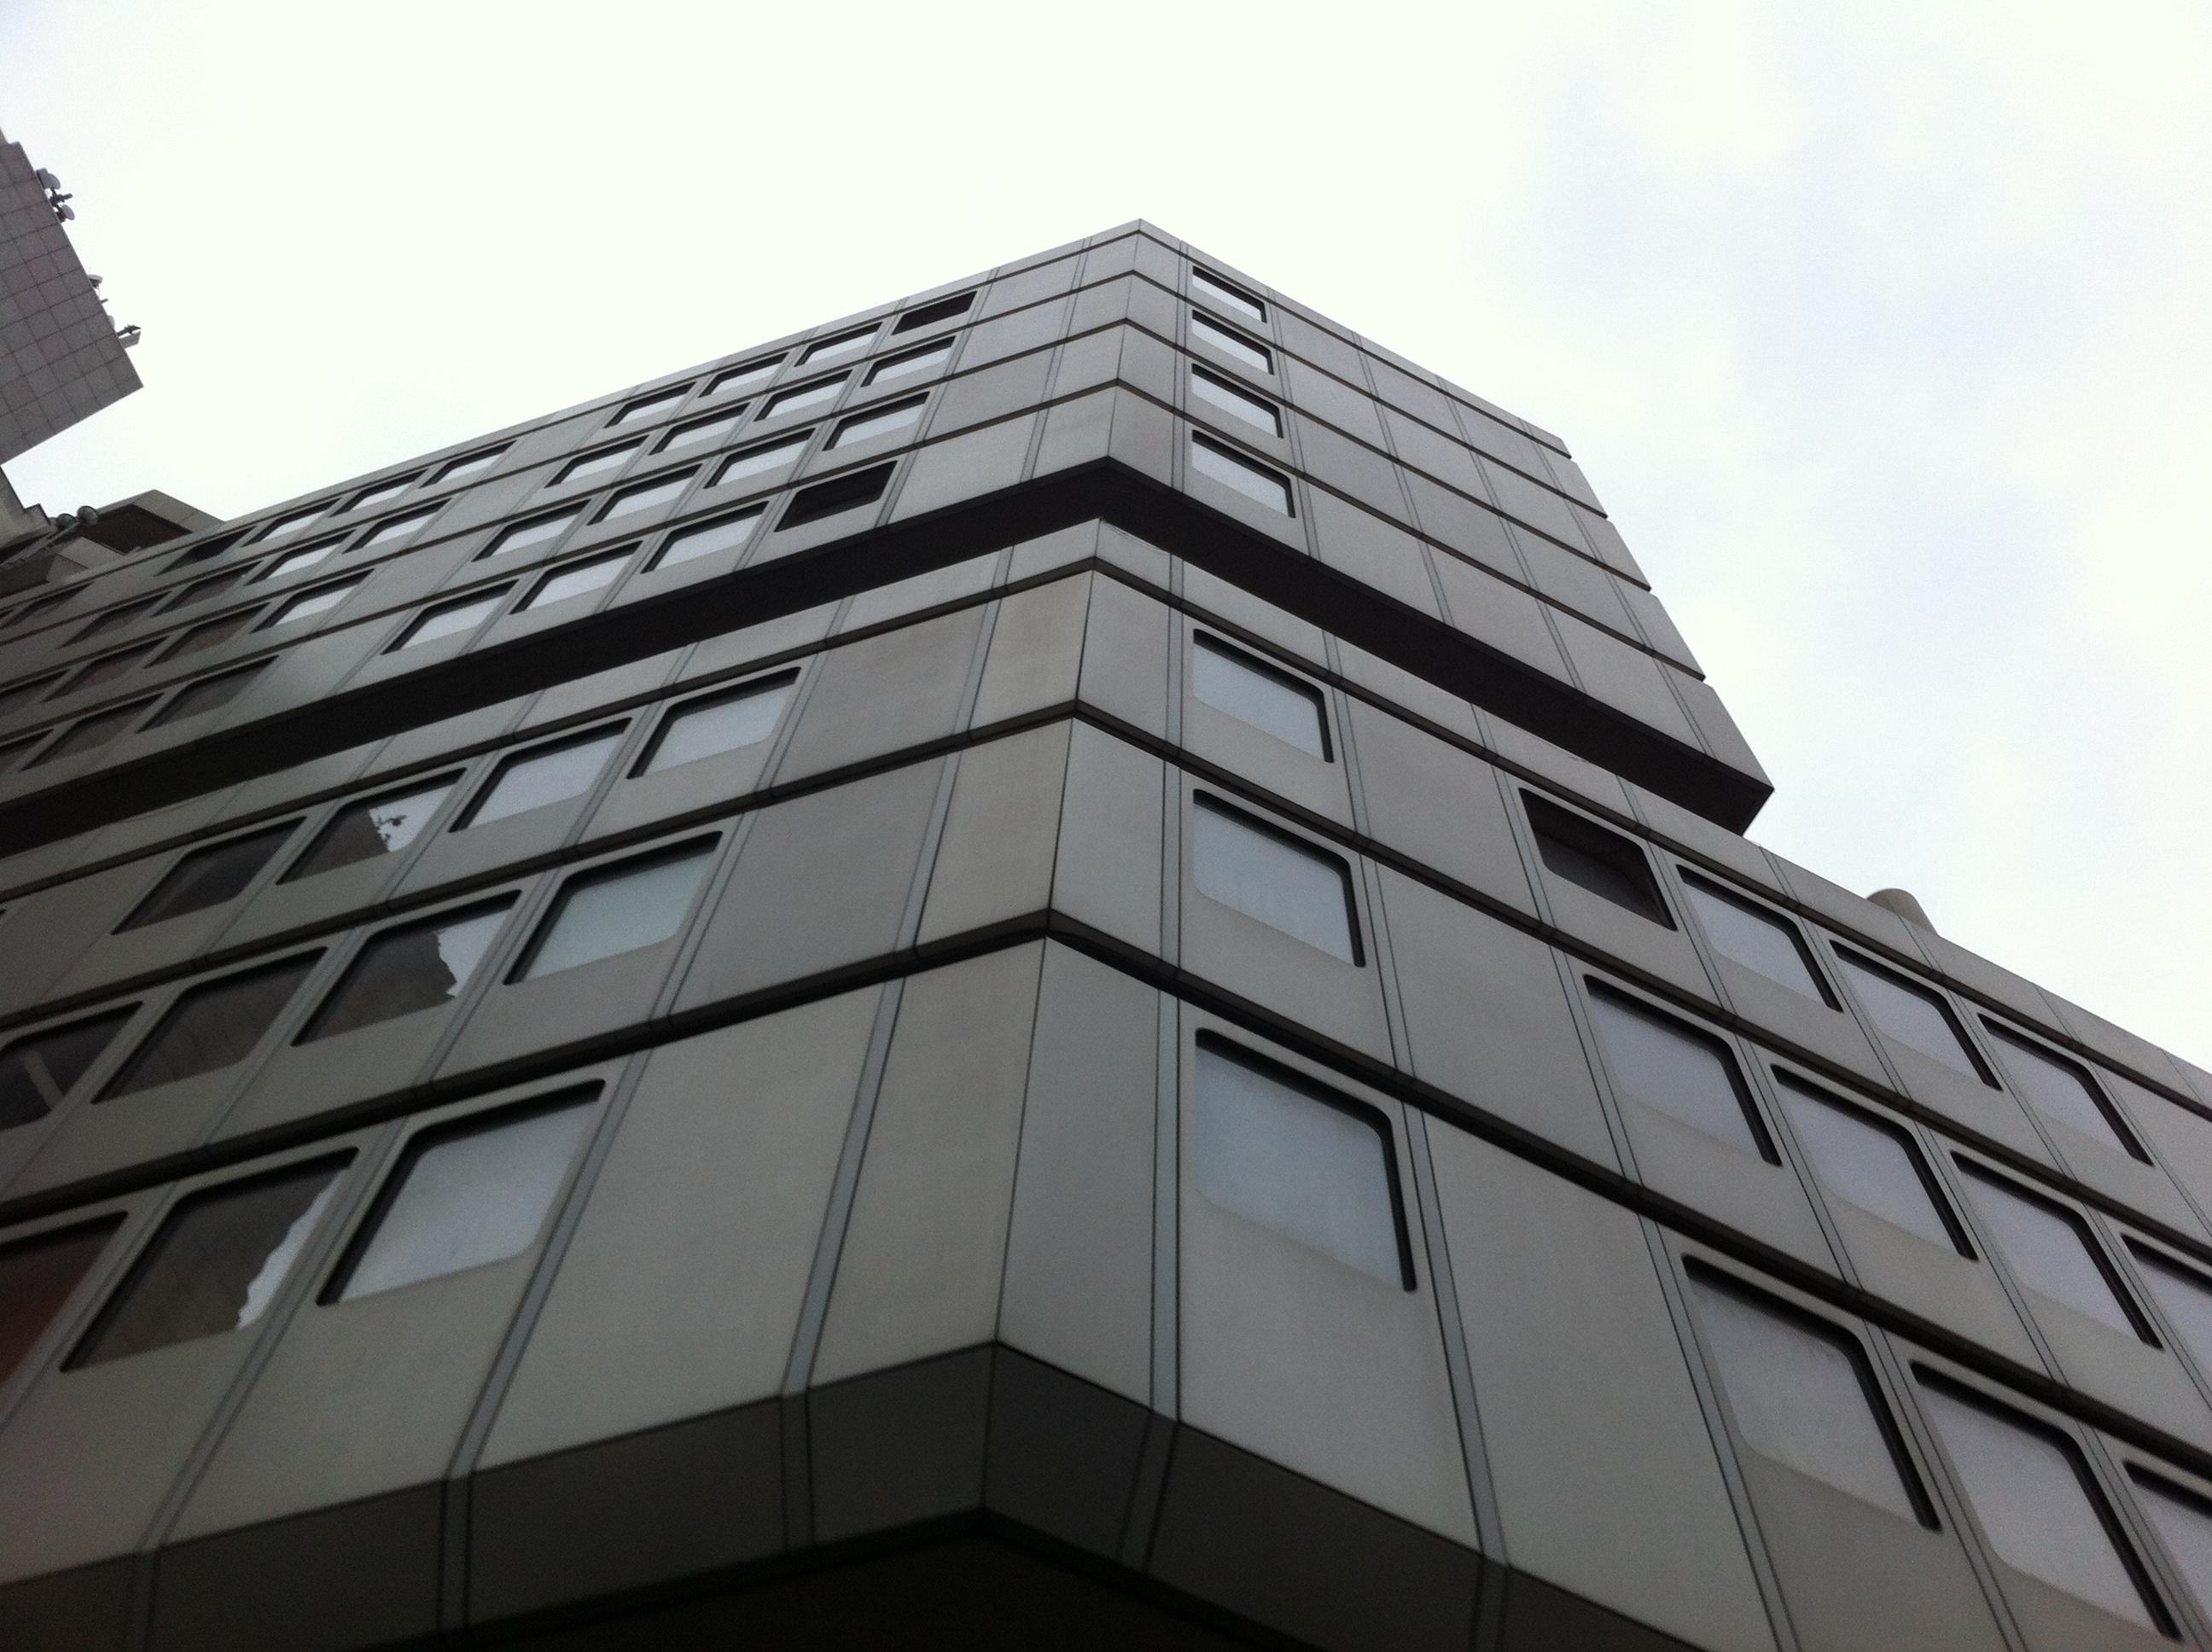 aufbau rollger st dach hotel in d sseldorf. Black Bedroom Furniture Sets. Home Design Ideas